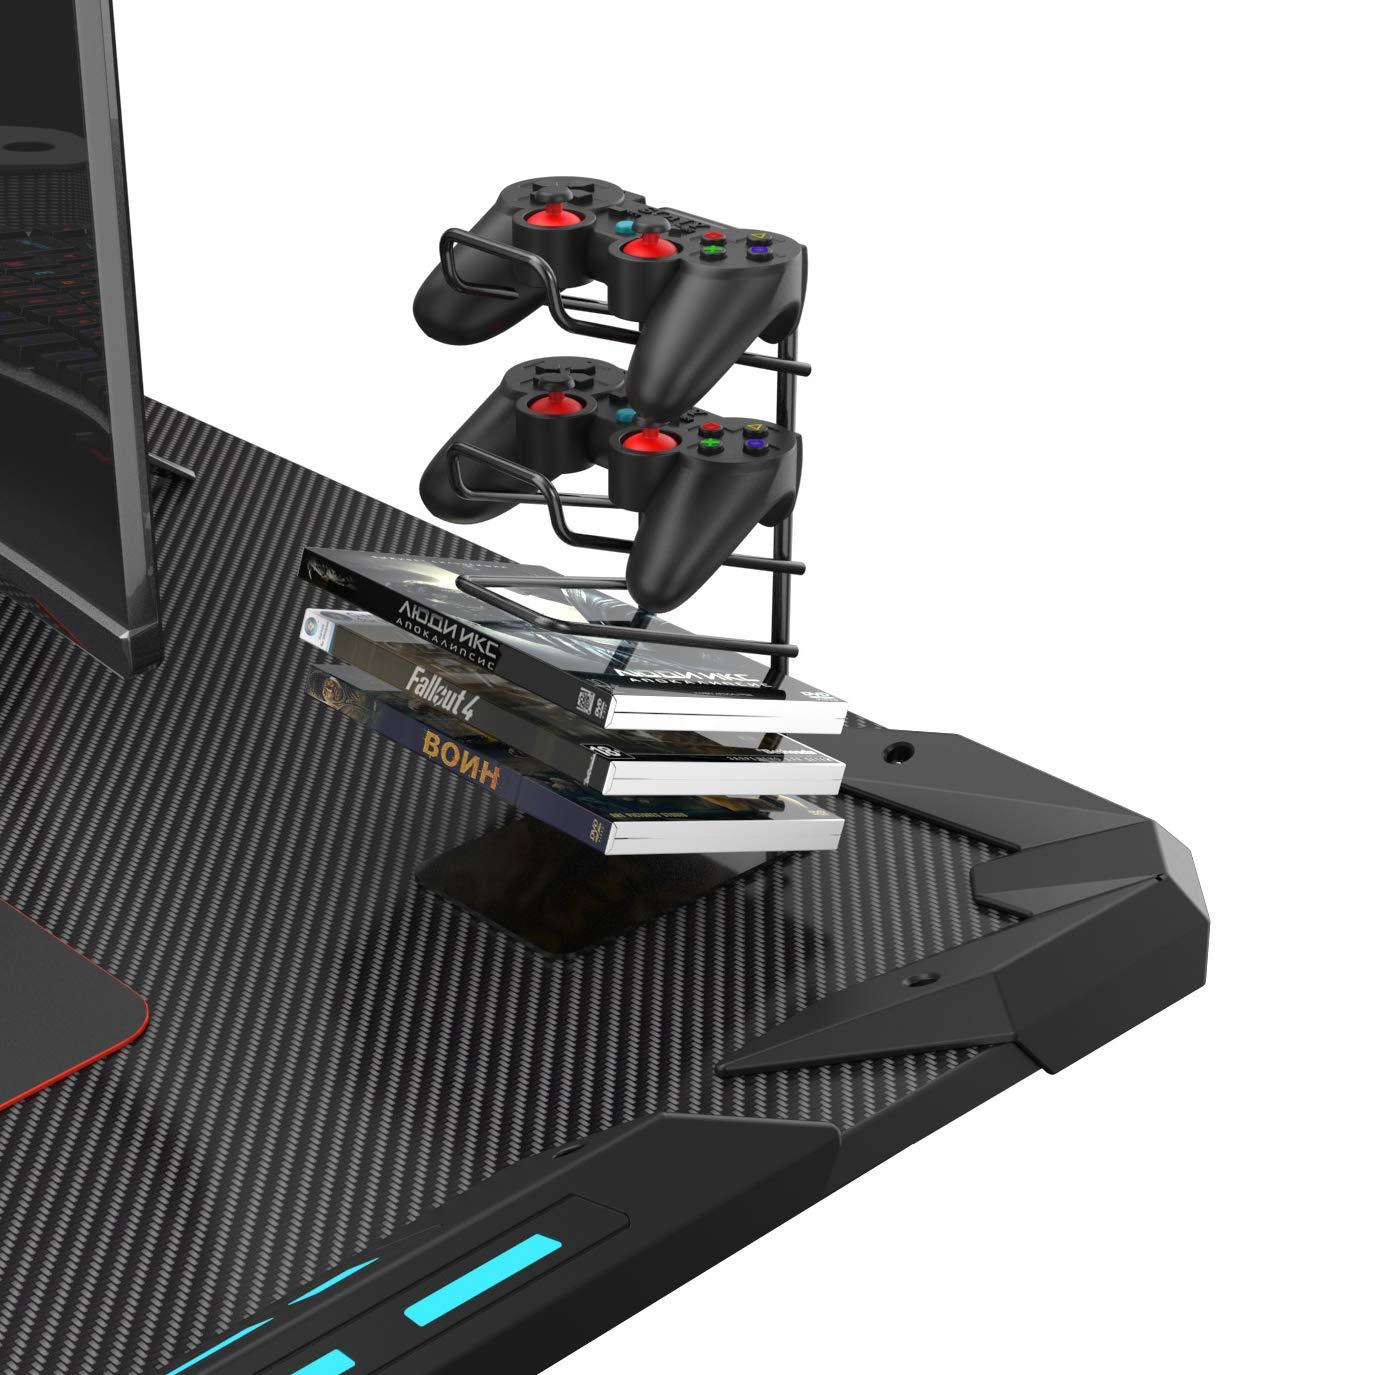 Eureka Ergonomic X1-S Gaming Computer Desk 44.5''x24.19'' Studio Desk PC Table Gaming Desks with LED Lights Large Carbon Fiber Surface Cup Holder & Headphone Hook-Black by Eureka Ergonomic (Image #6)